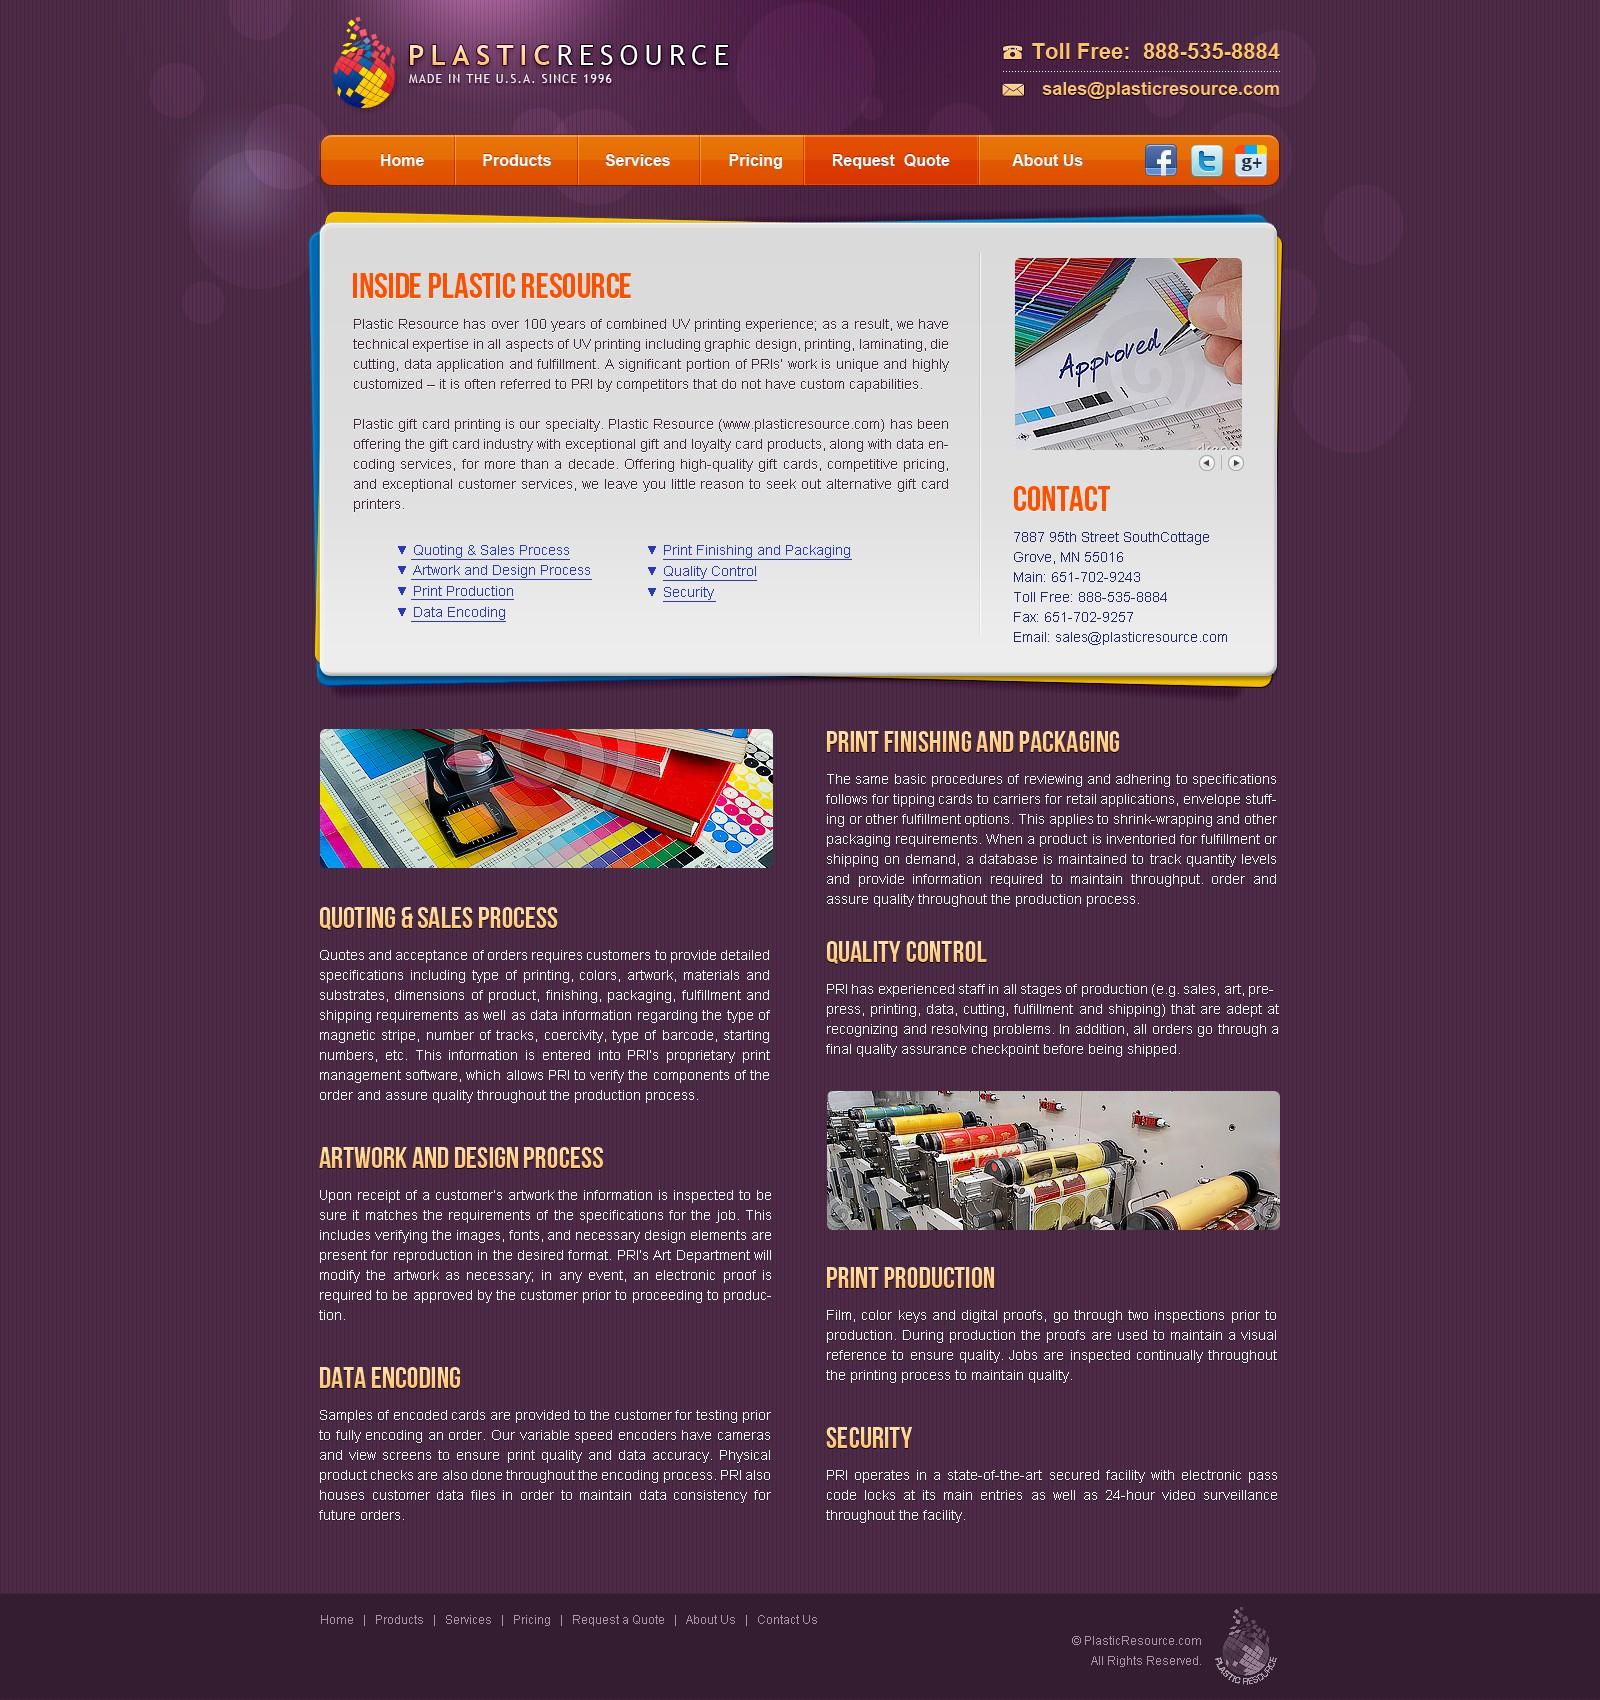 Plastic Resource needs a new website design